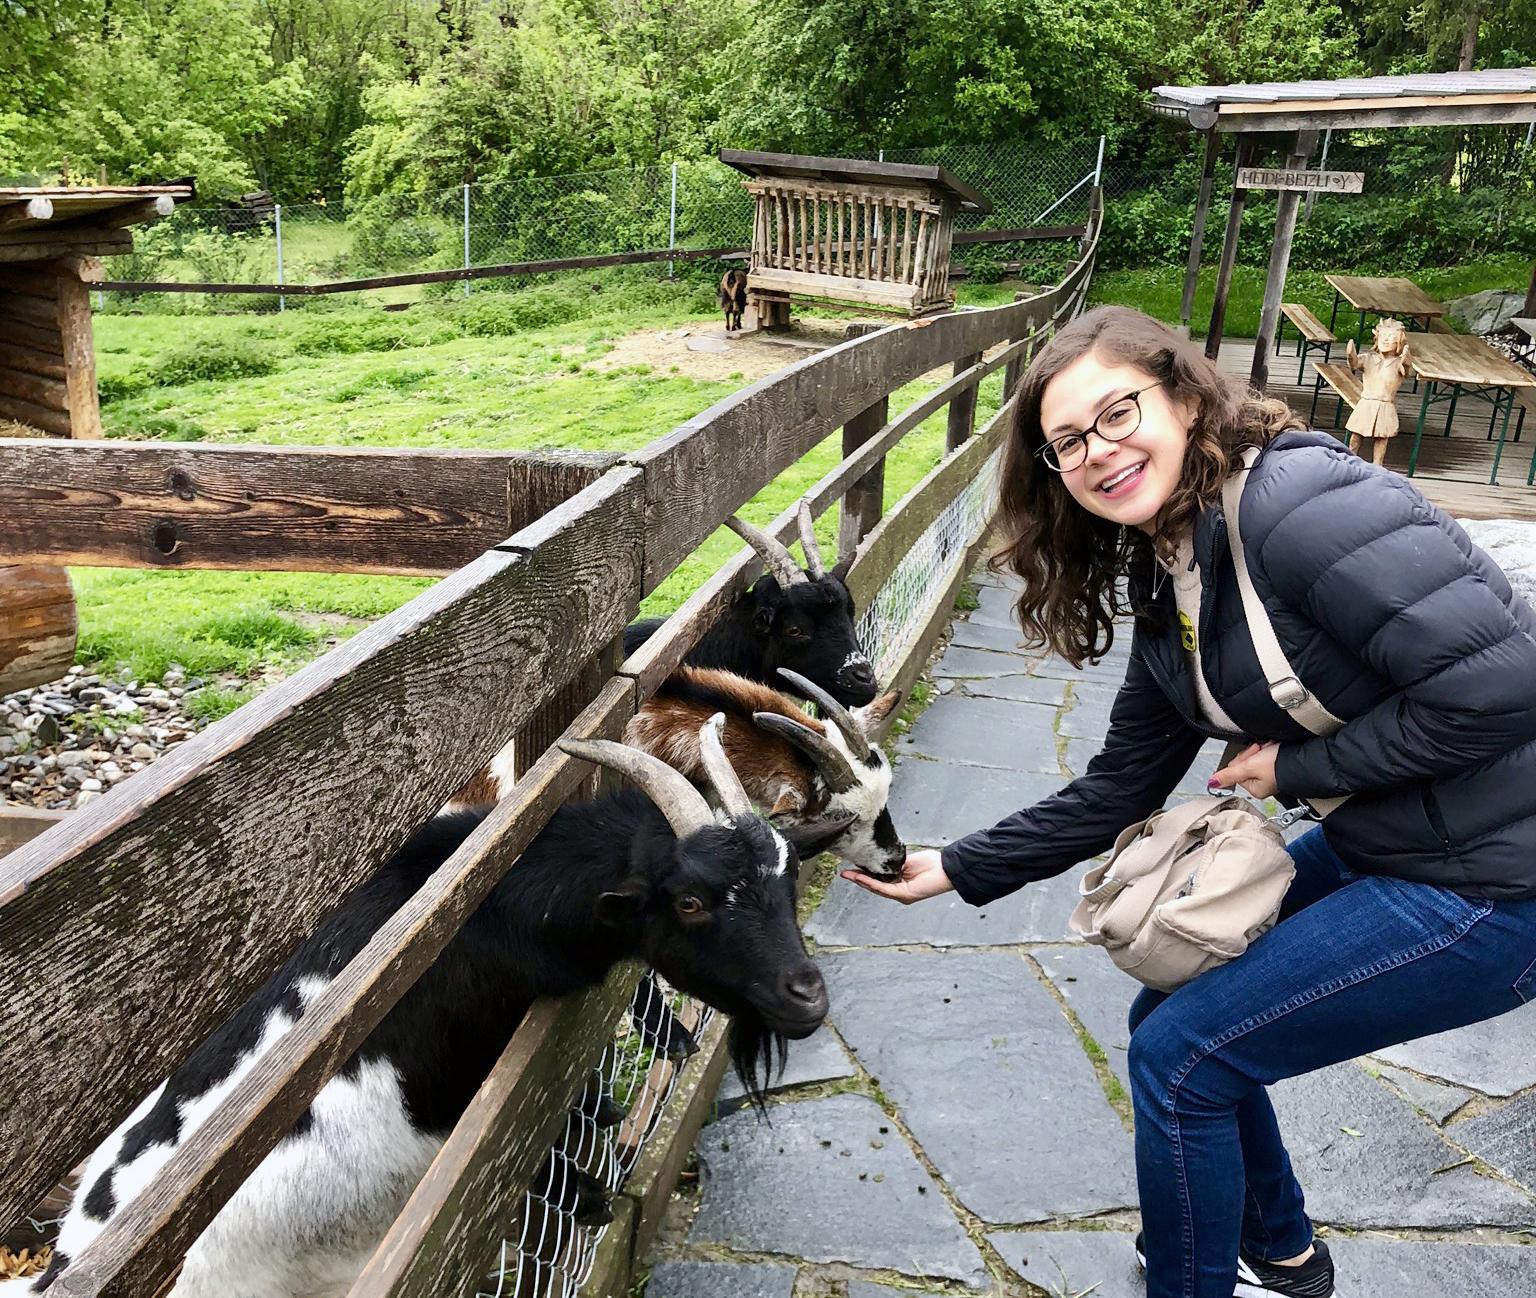 Andrea feeding goats in Maienfeld, Switzerland.